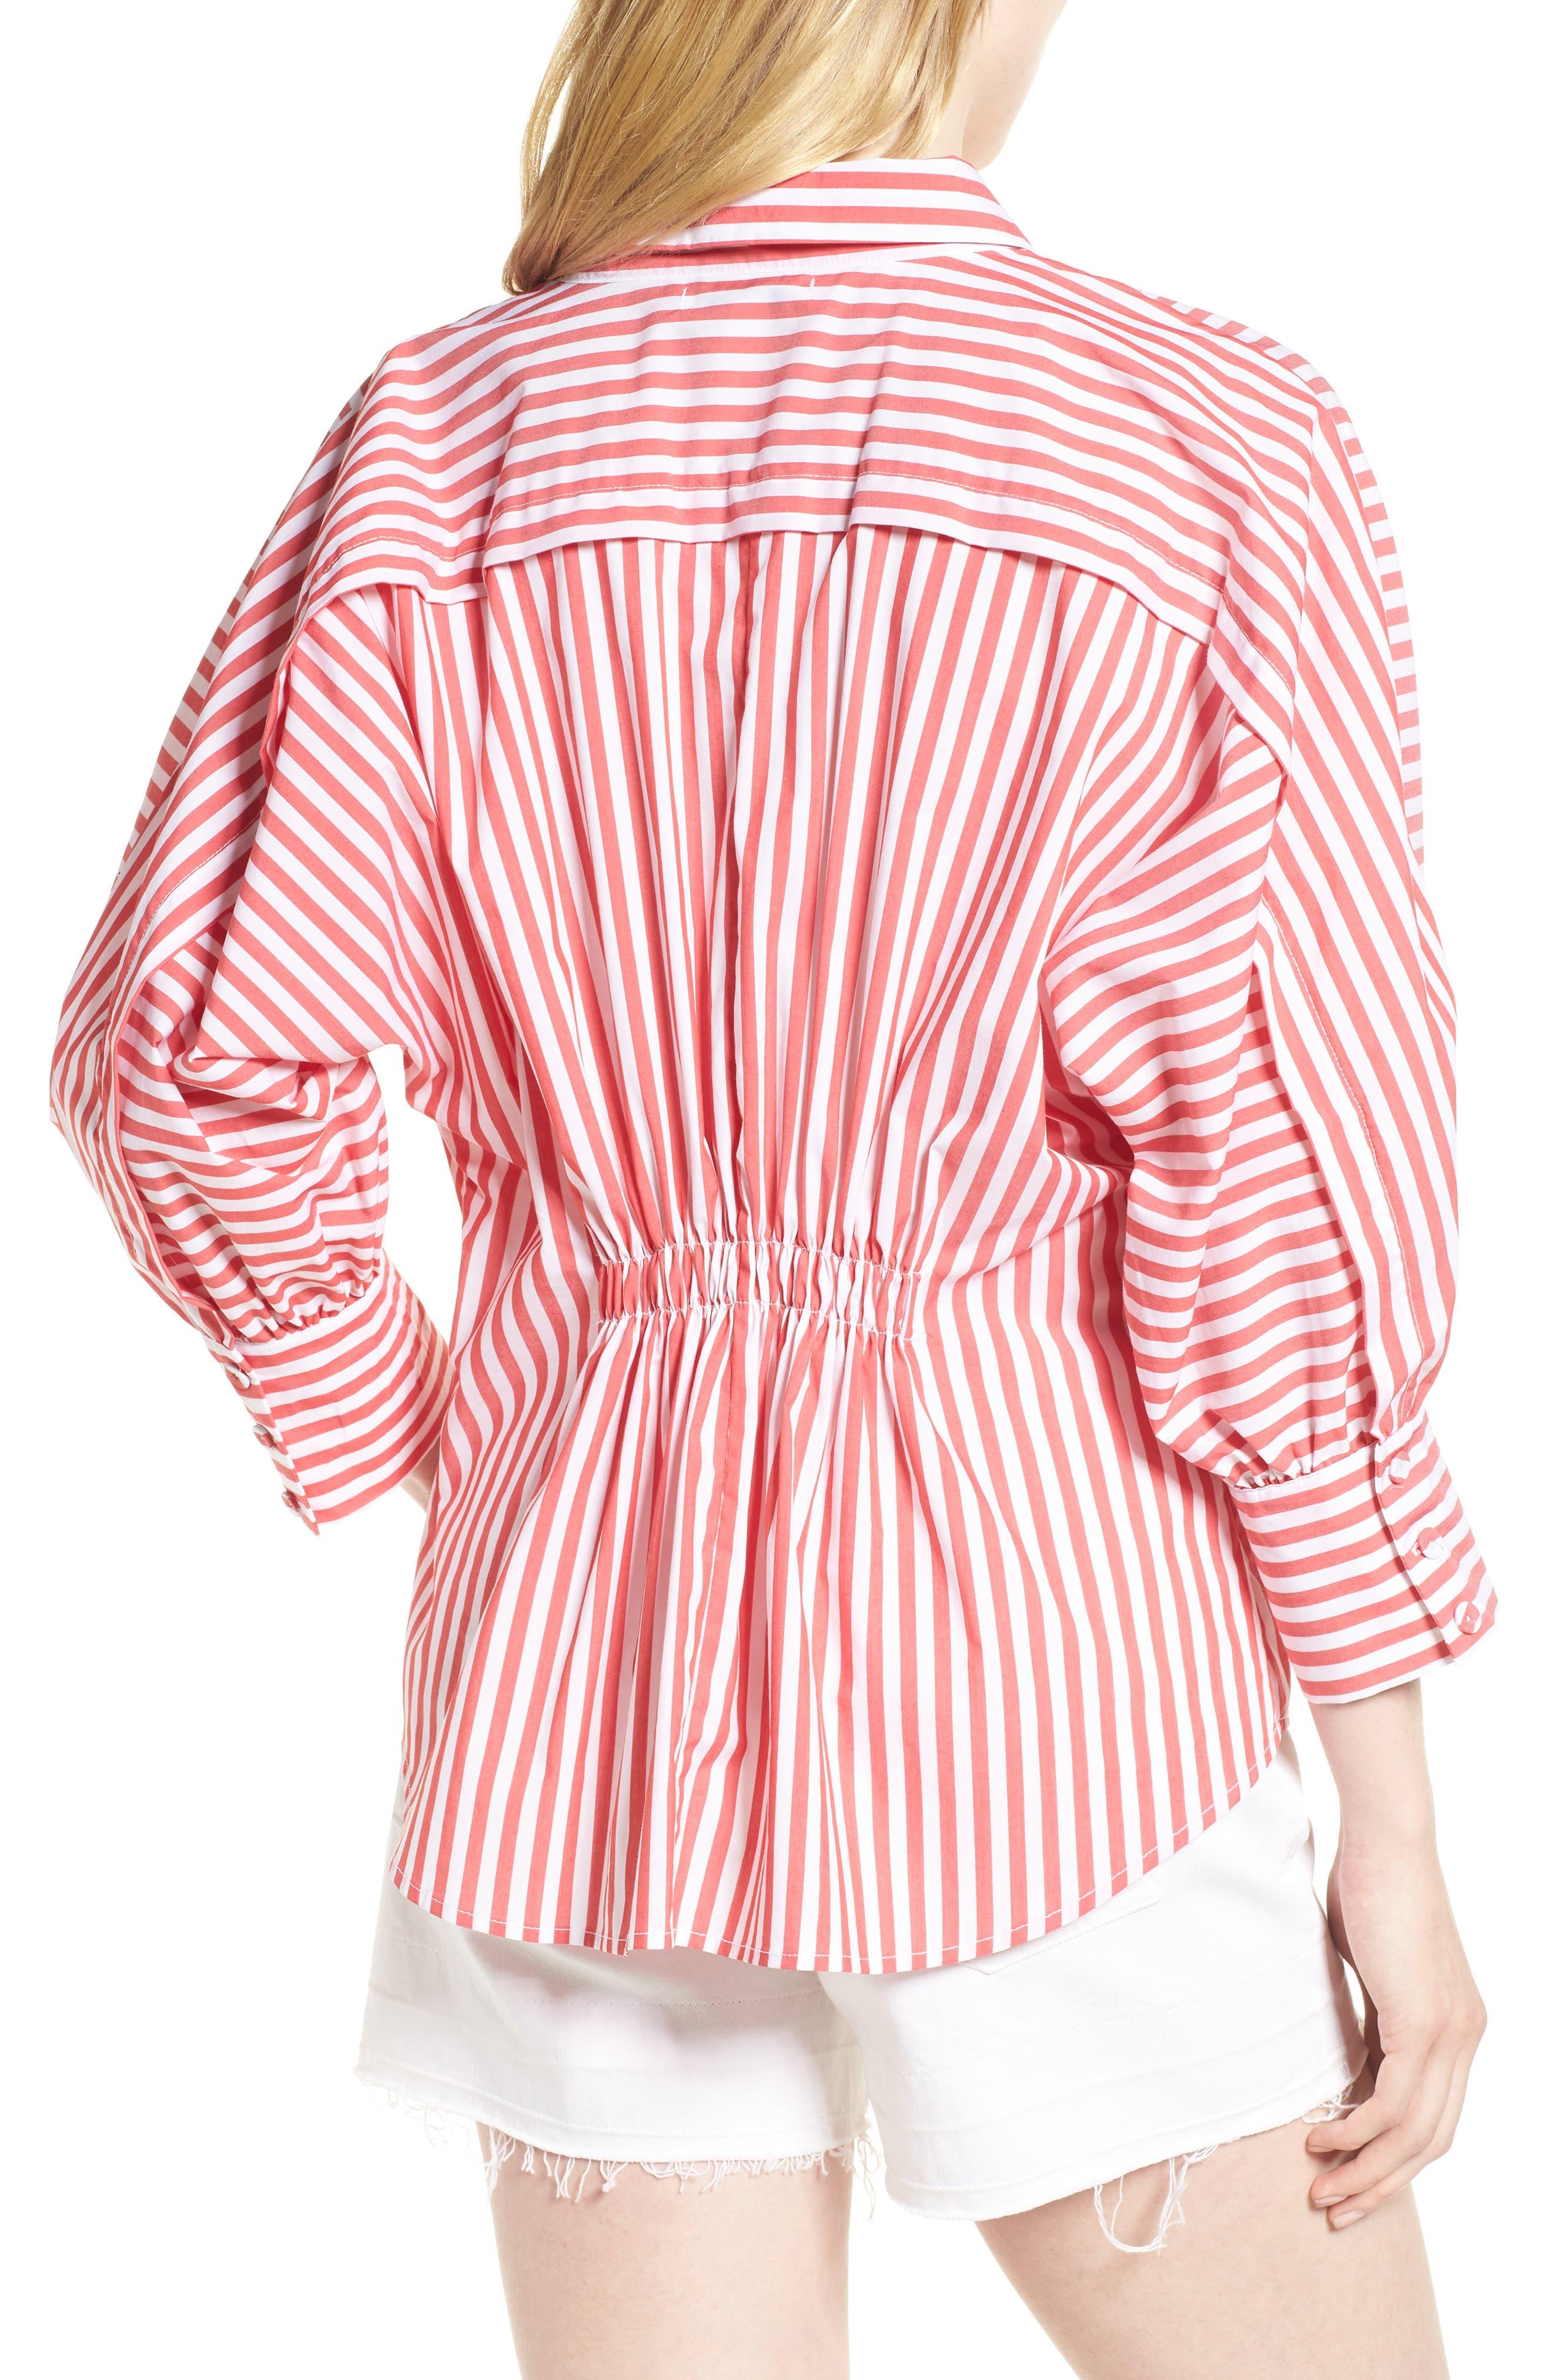 Asymmetrical Stripe Blouse,                             Alternate thumbnail 2, color,                             RED/ WHITE STRIPE